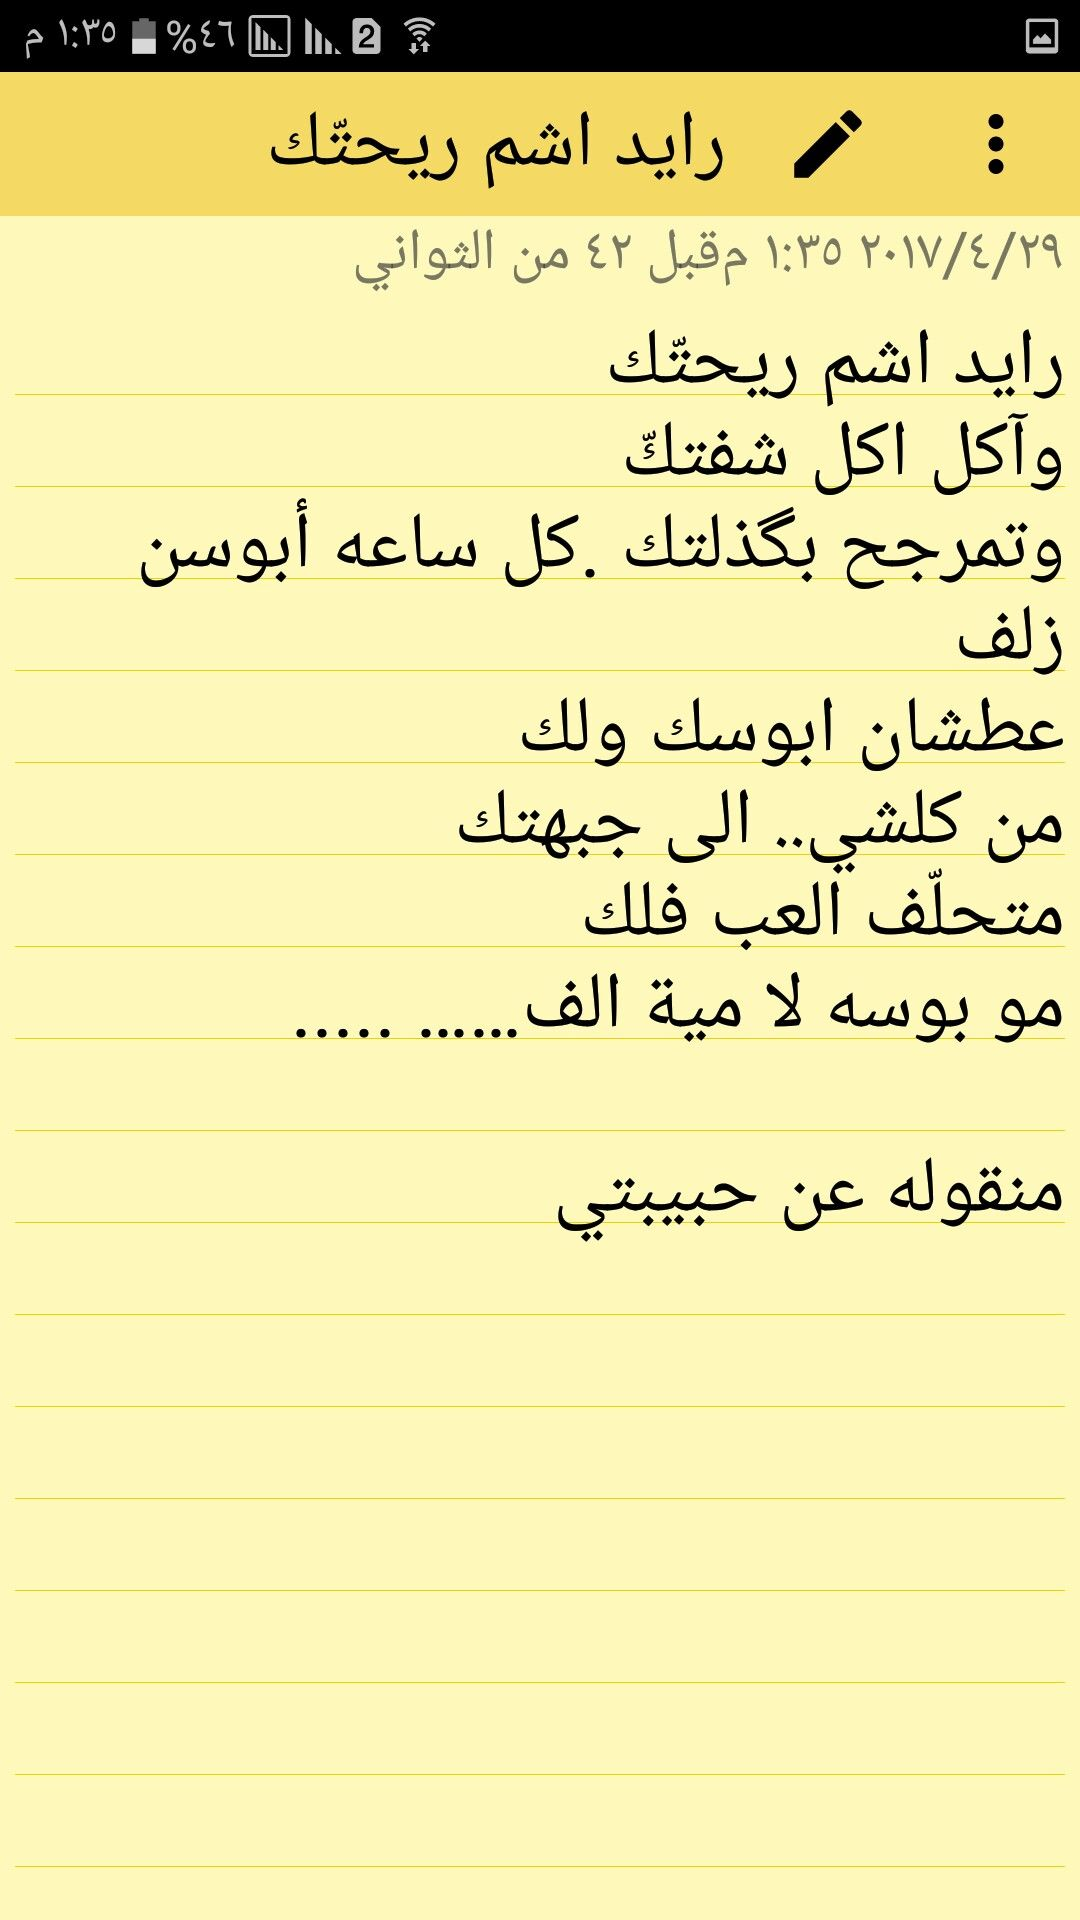 Pin By Jabbar Hasan On شعر شعبي عراقي Iphone Wallpaper Math E 9